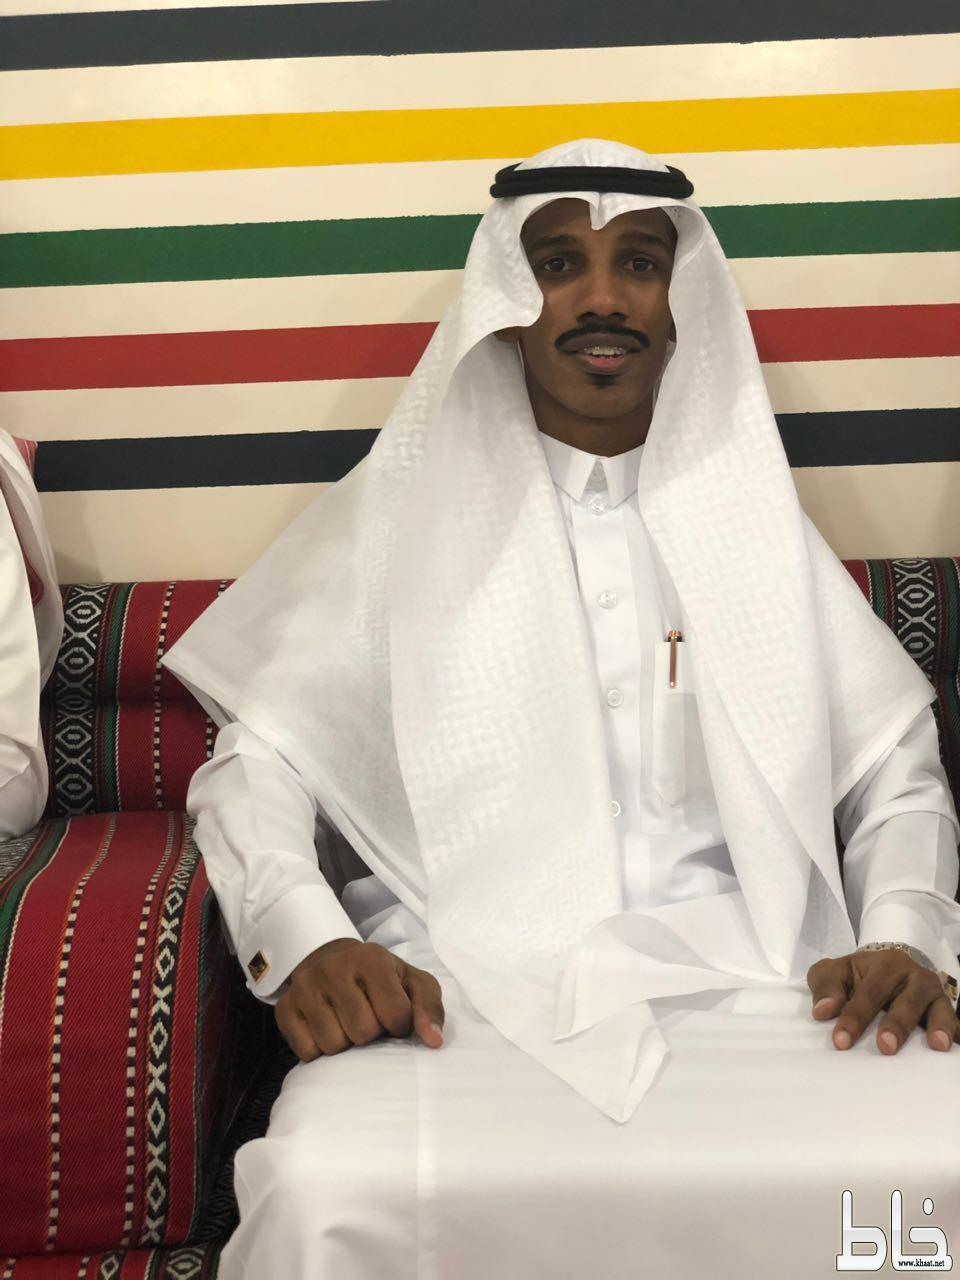 عادل احمد سالم يحتفل بقرانه